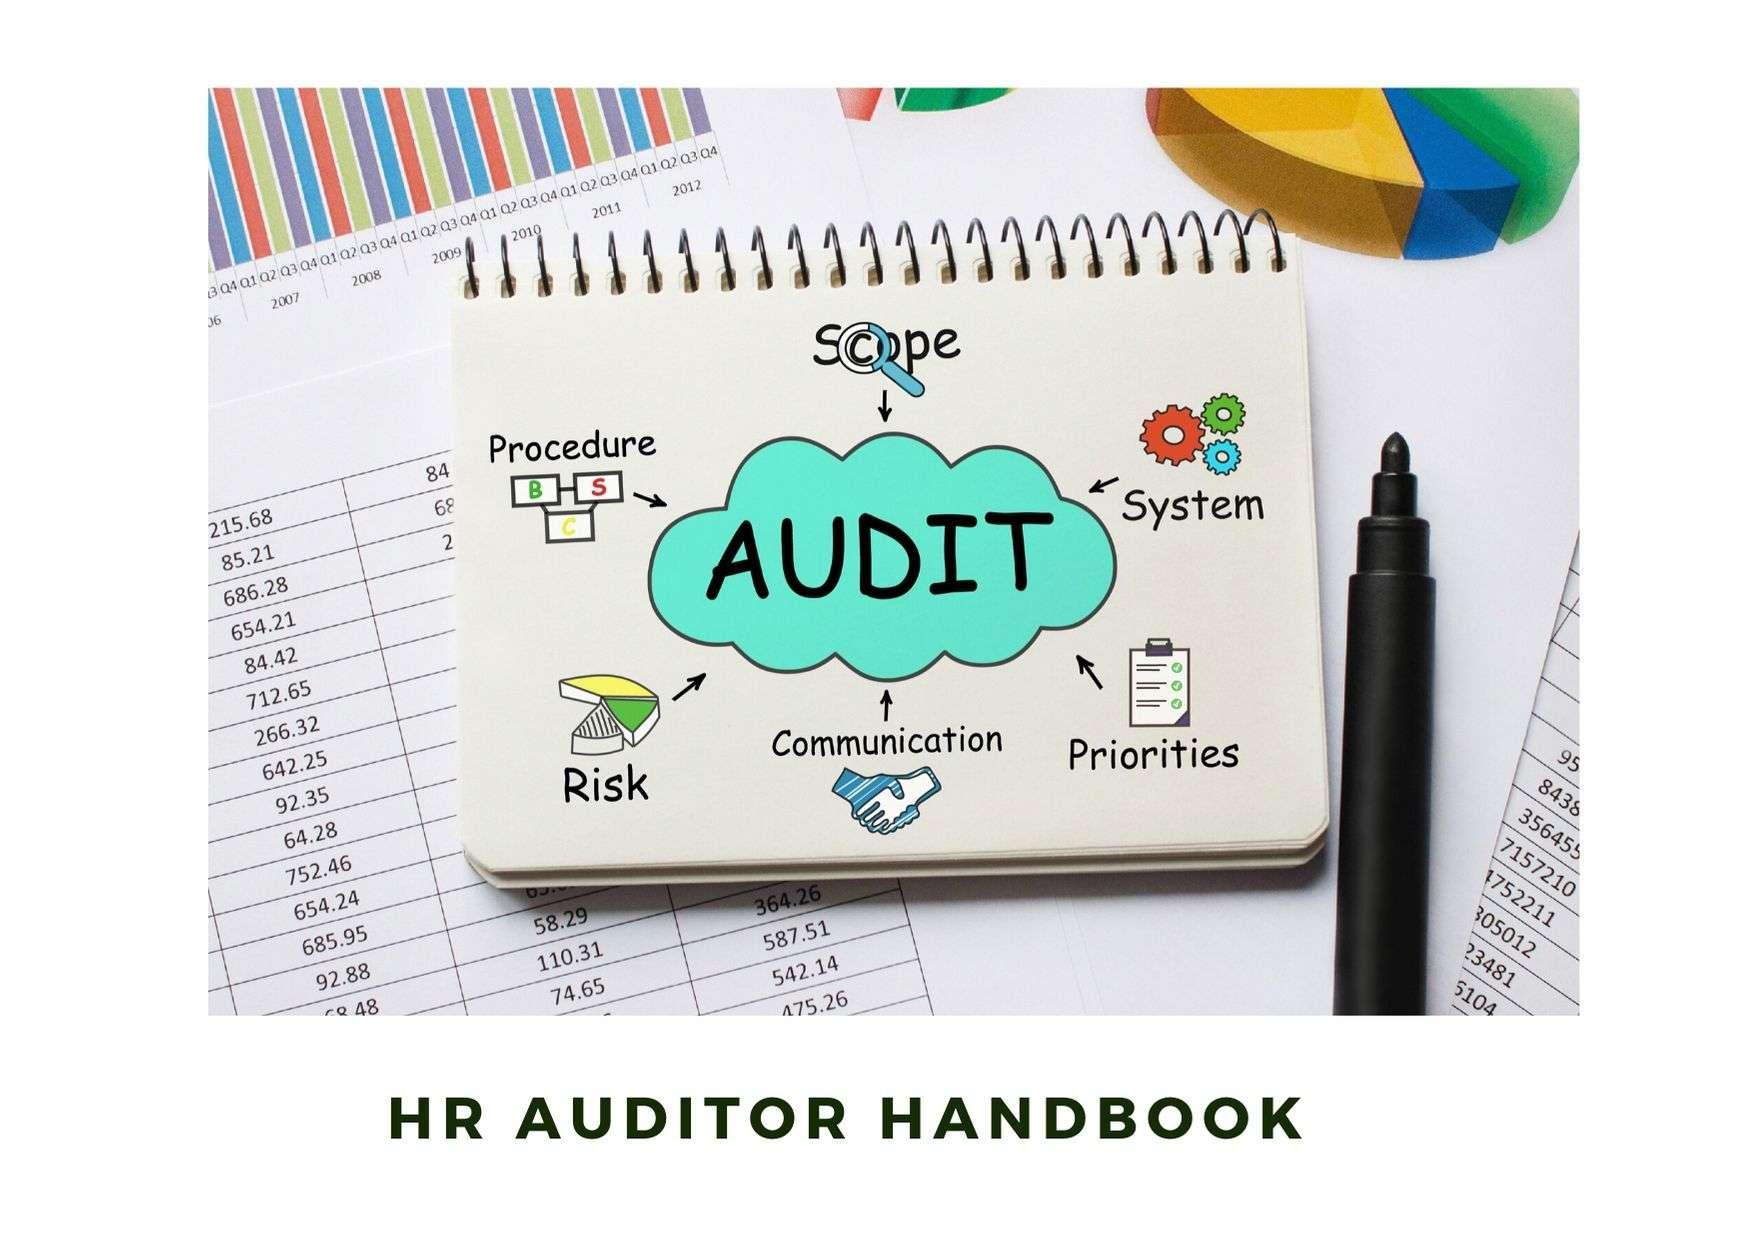 HR Auditor Handbook